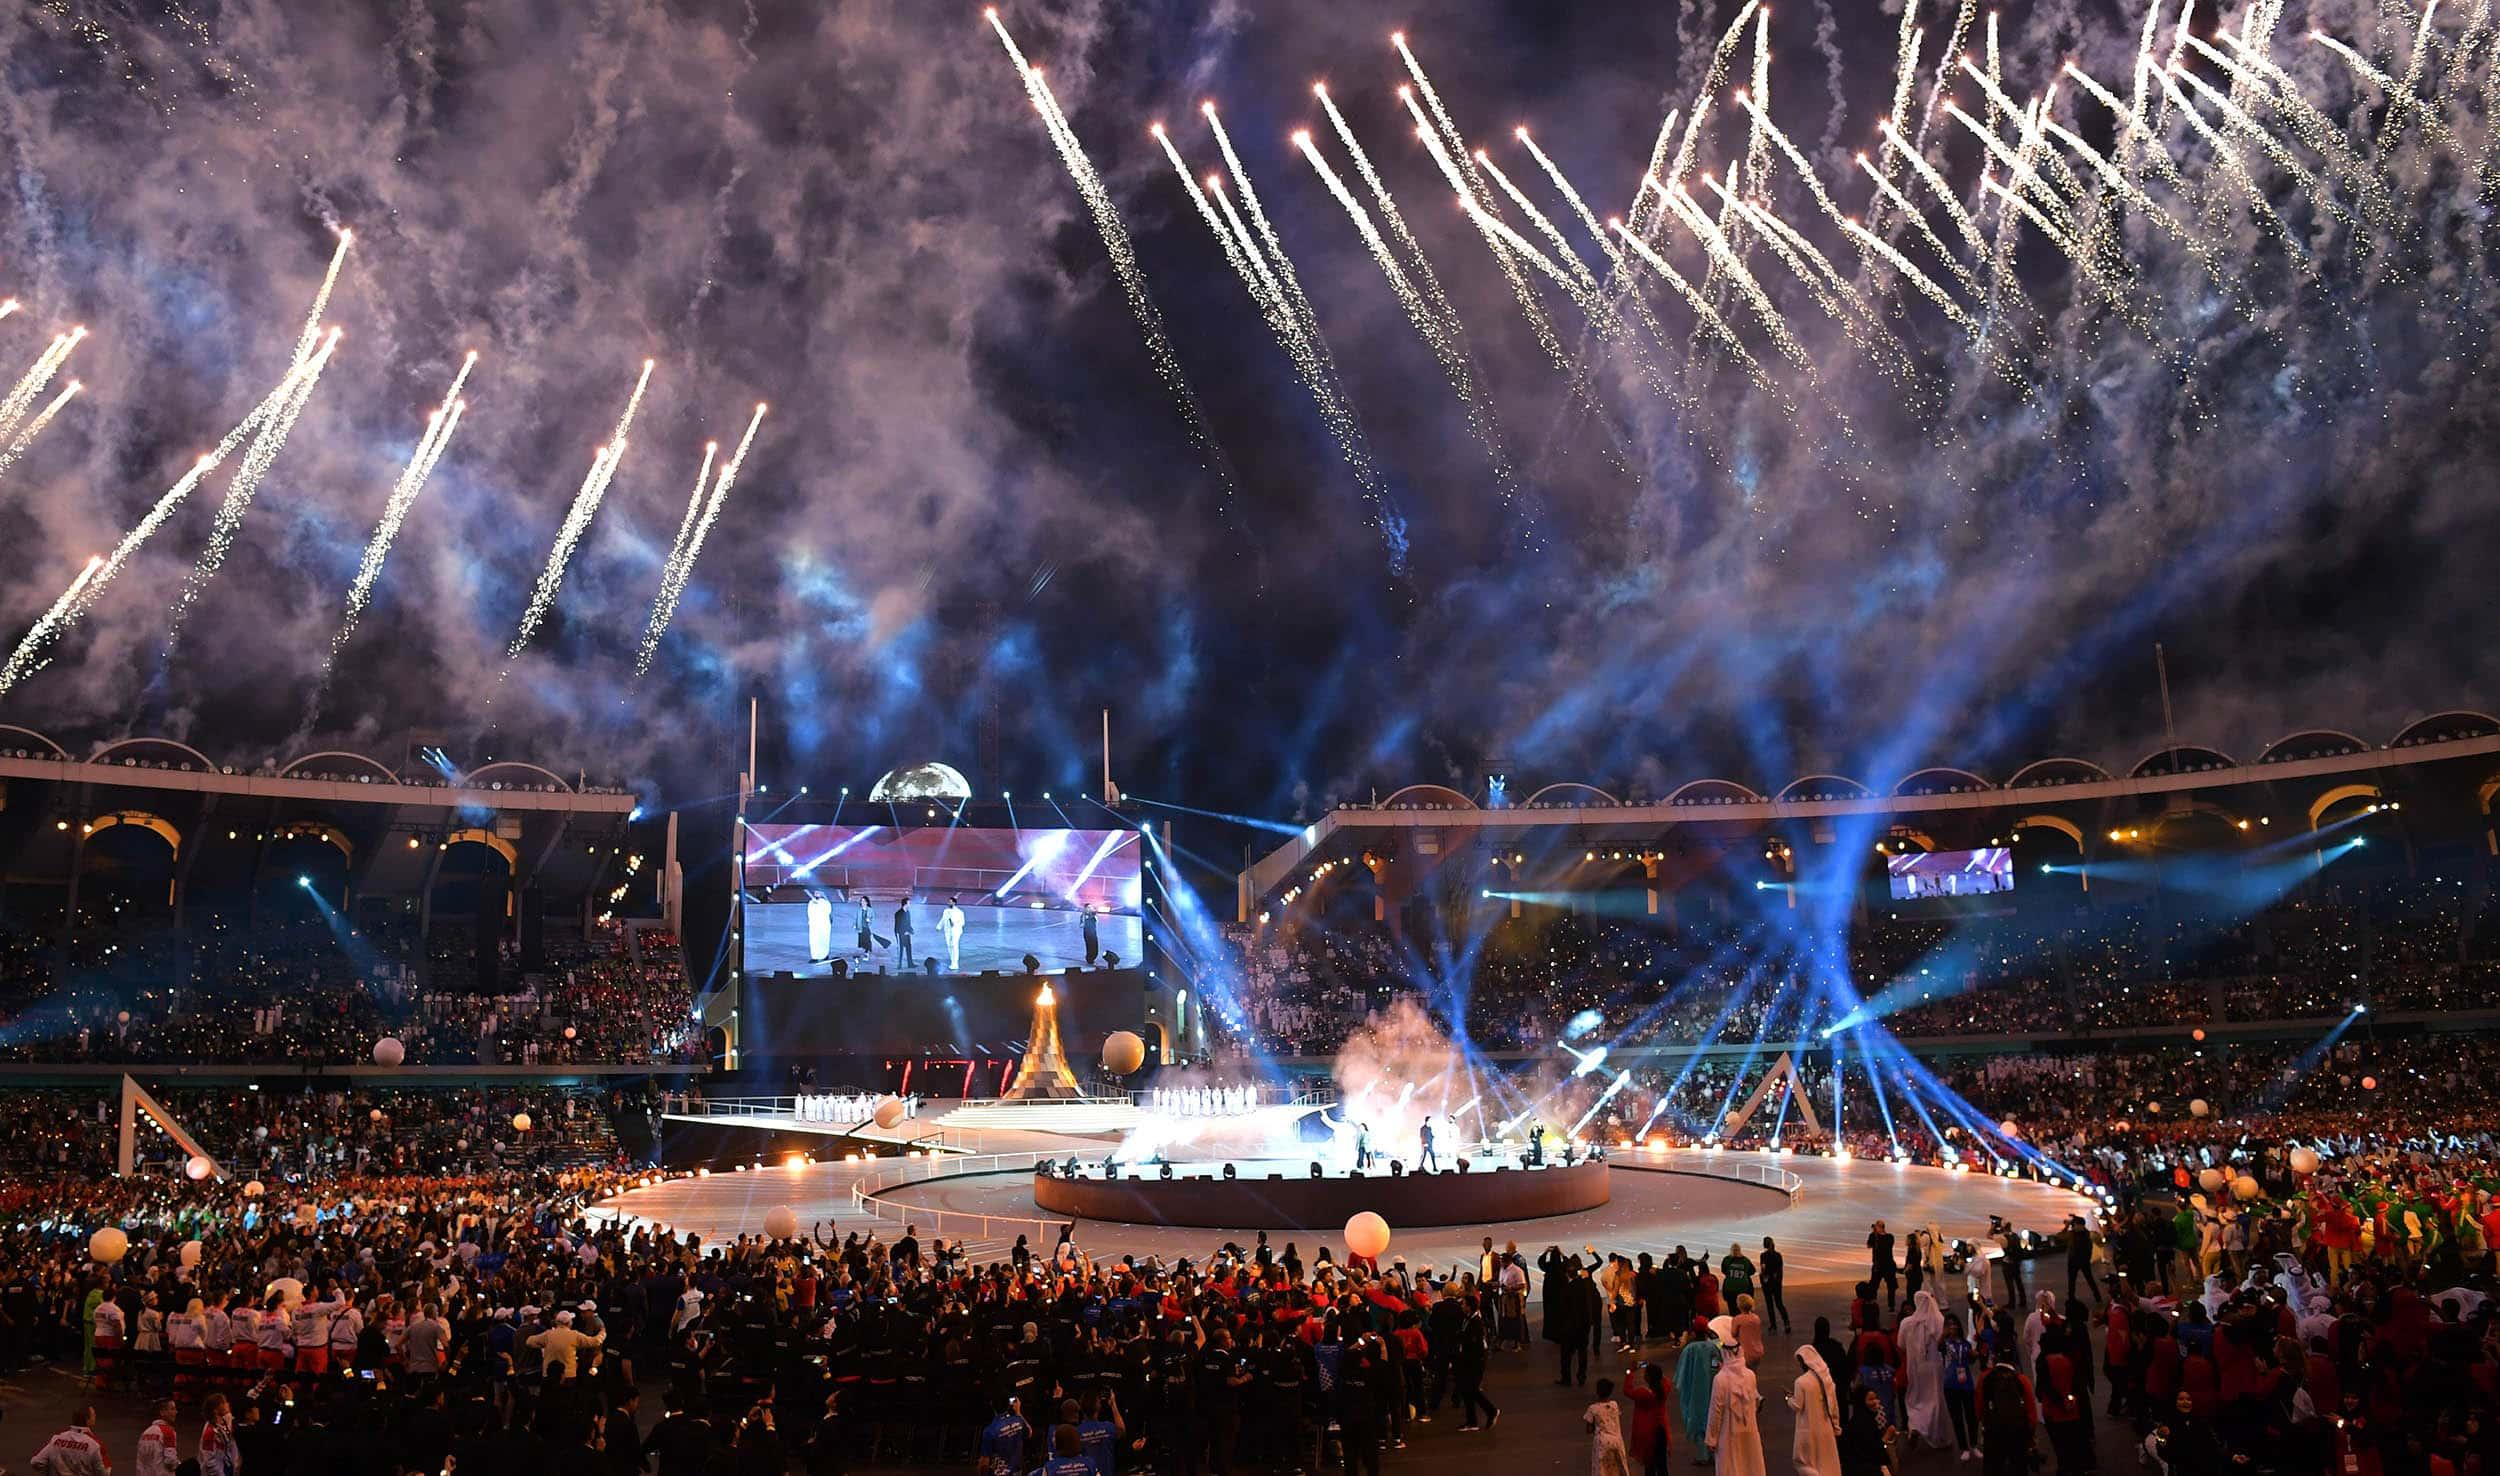 Нұрсұлтан Назарбаев Дүниежүзілік Арнайы Олимпиада